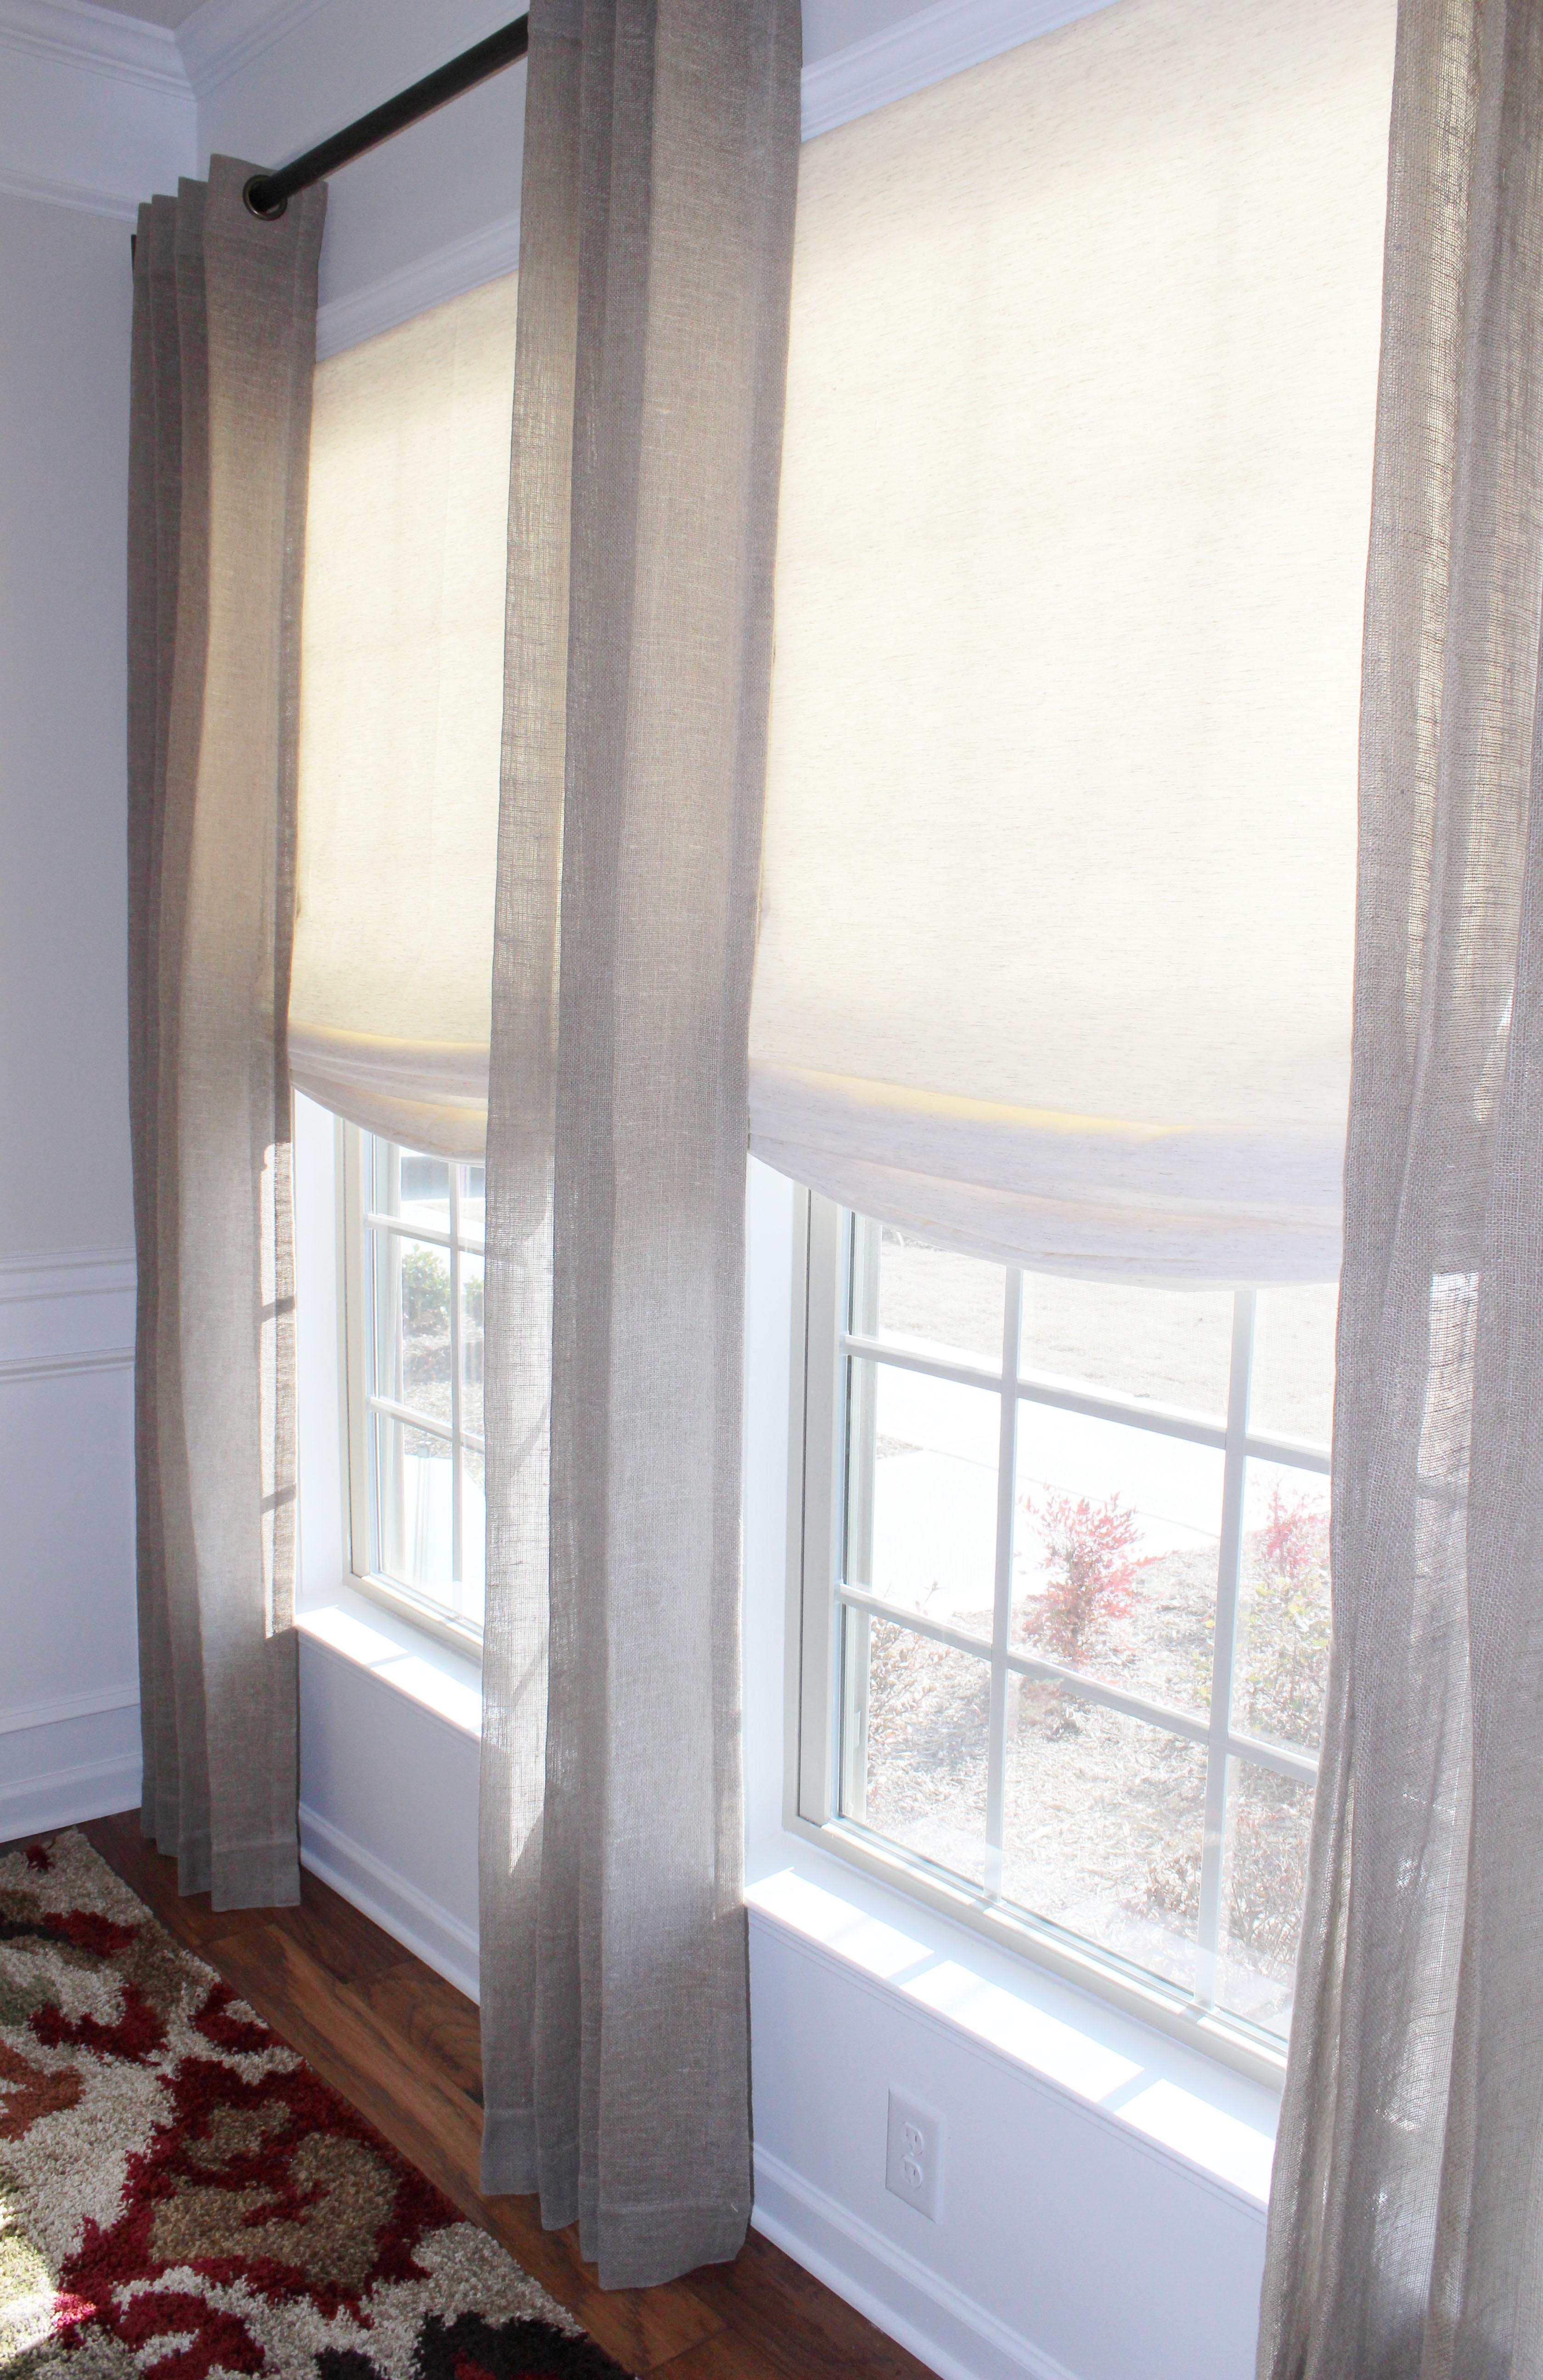 Linen window treatments - Linen Grommet Drapes Cordless Roman Shade